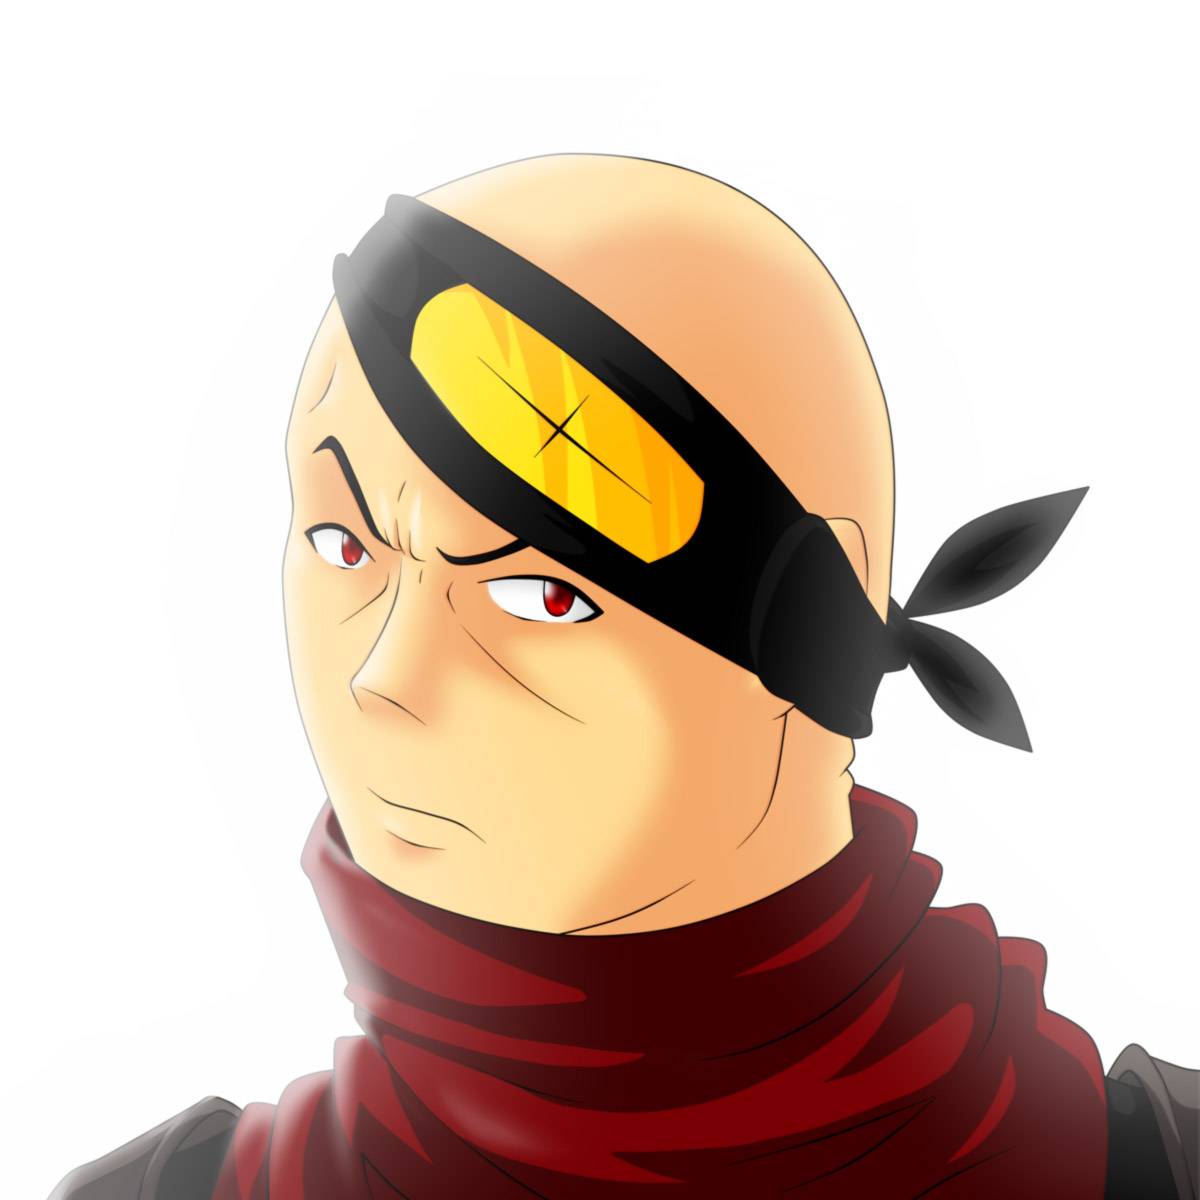 Korosai's face